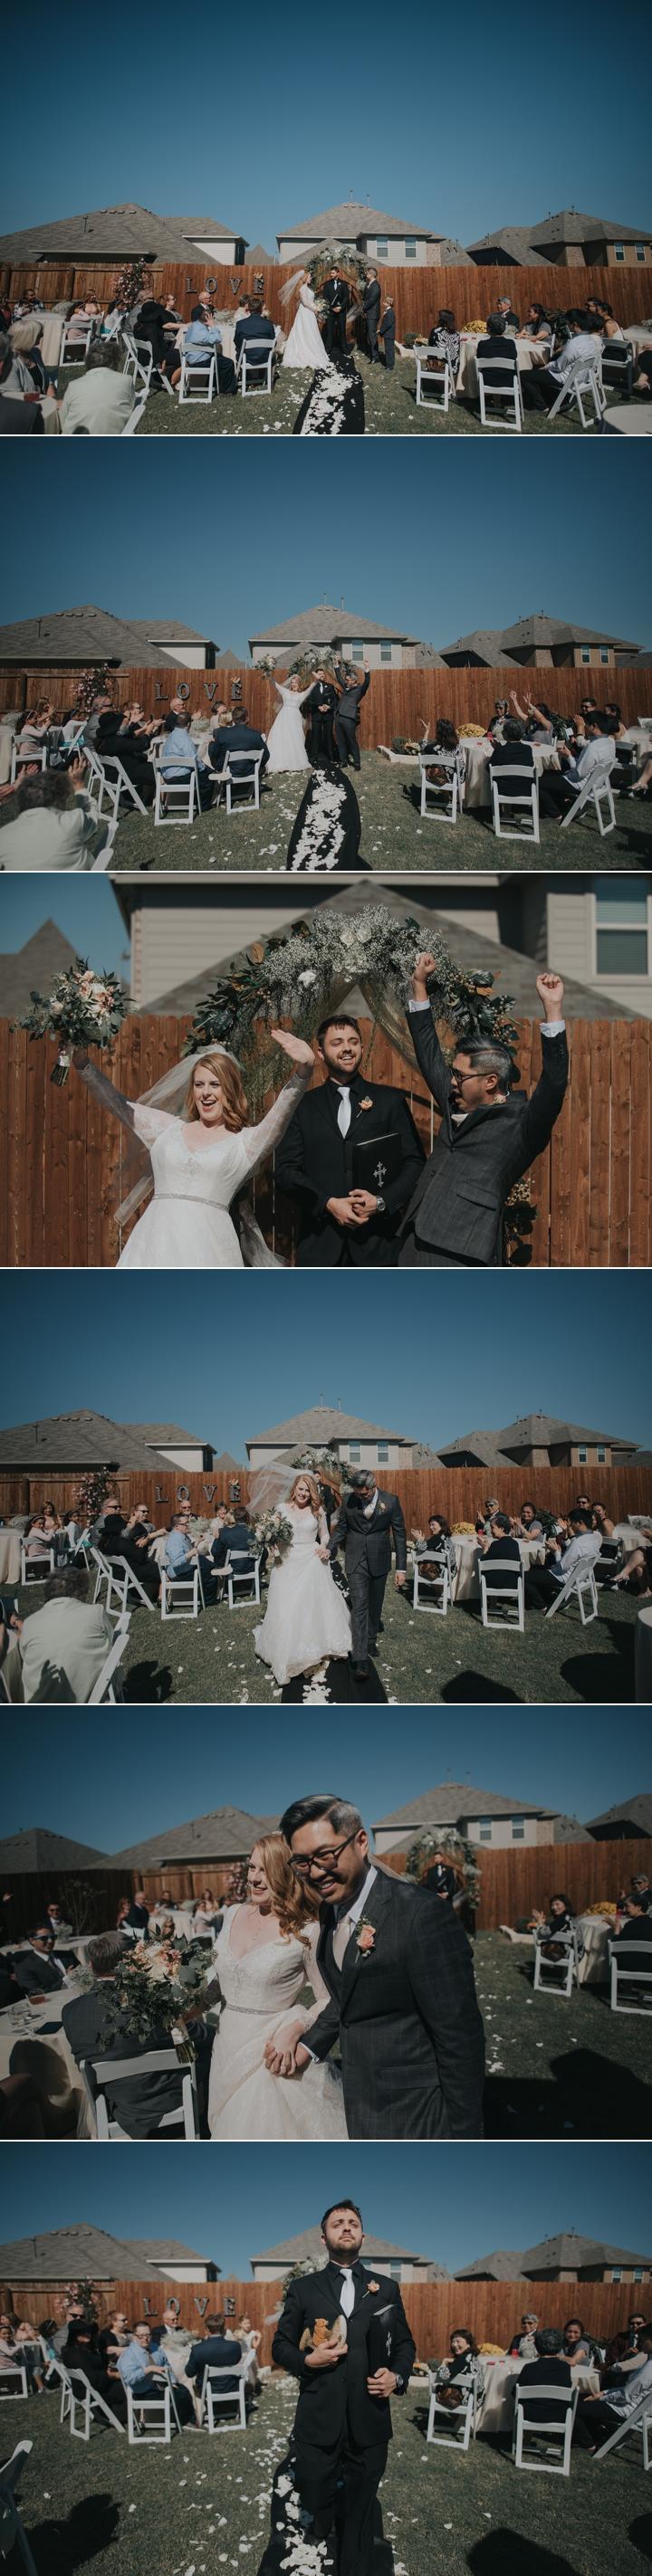 dallas-wedding-photographers-vb 8.jpg